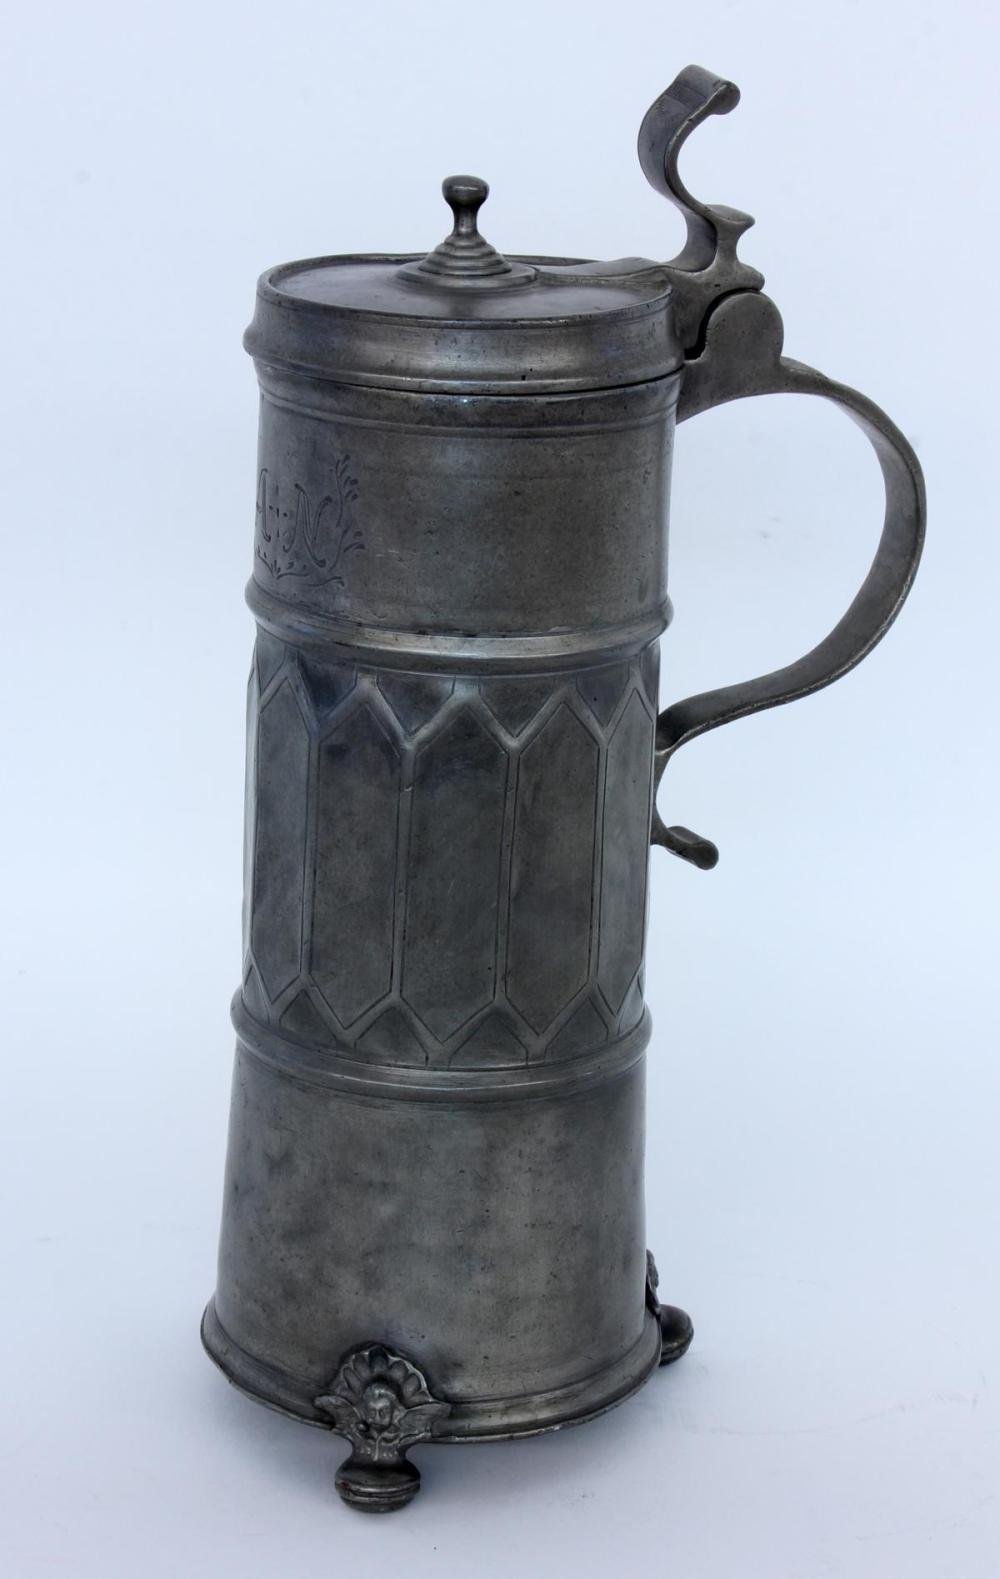 A HISTORICISM BEER STEIN 19th century Pewter